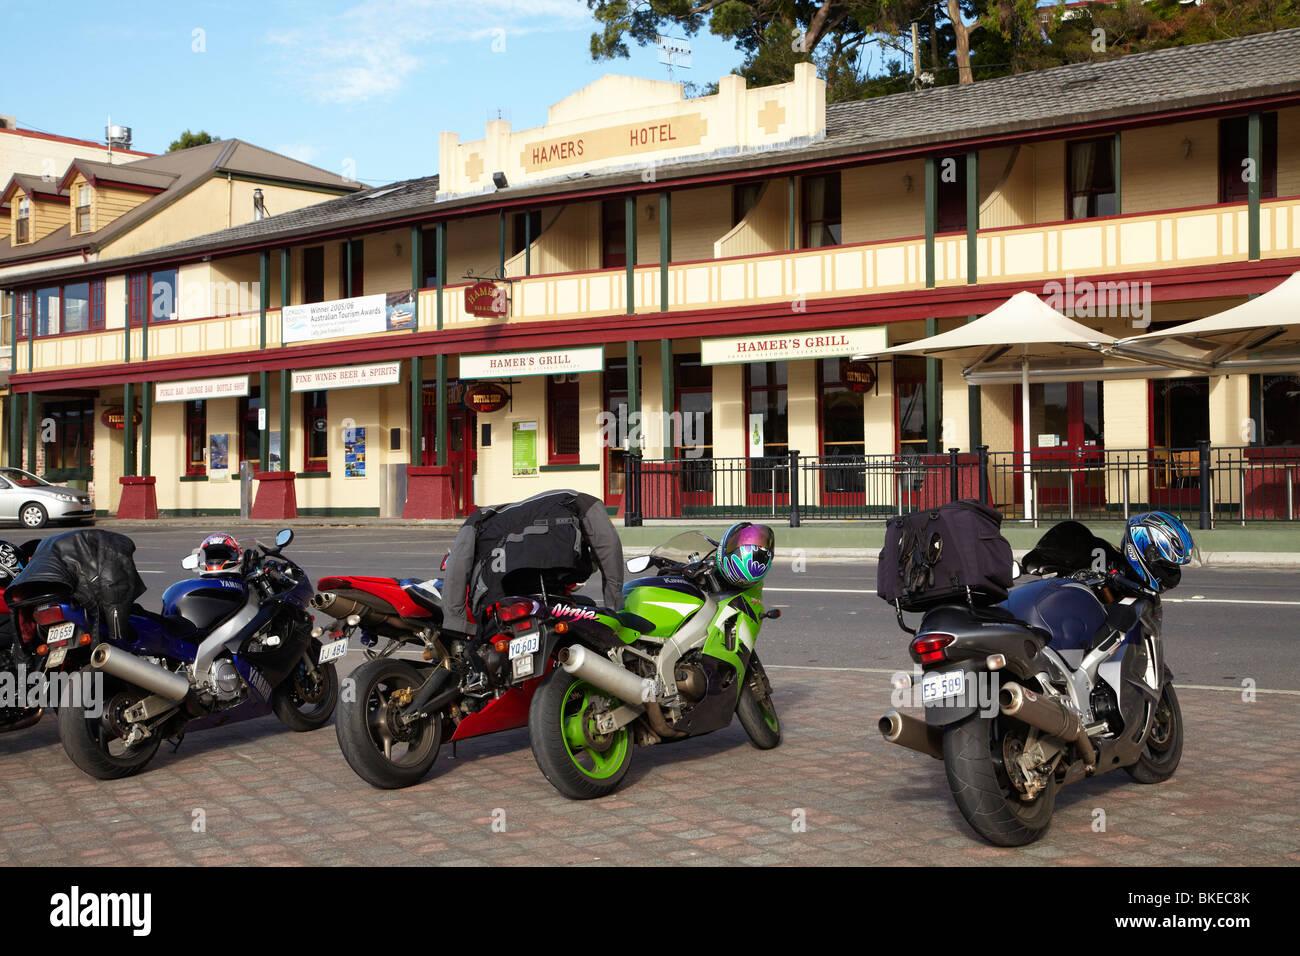 Motorbikes and Hamers Hotel, Esplanade, Strahan, Western Tasmania, Australia - Stock Image